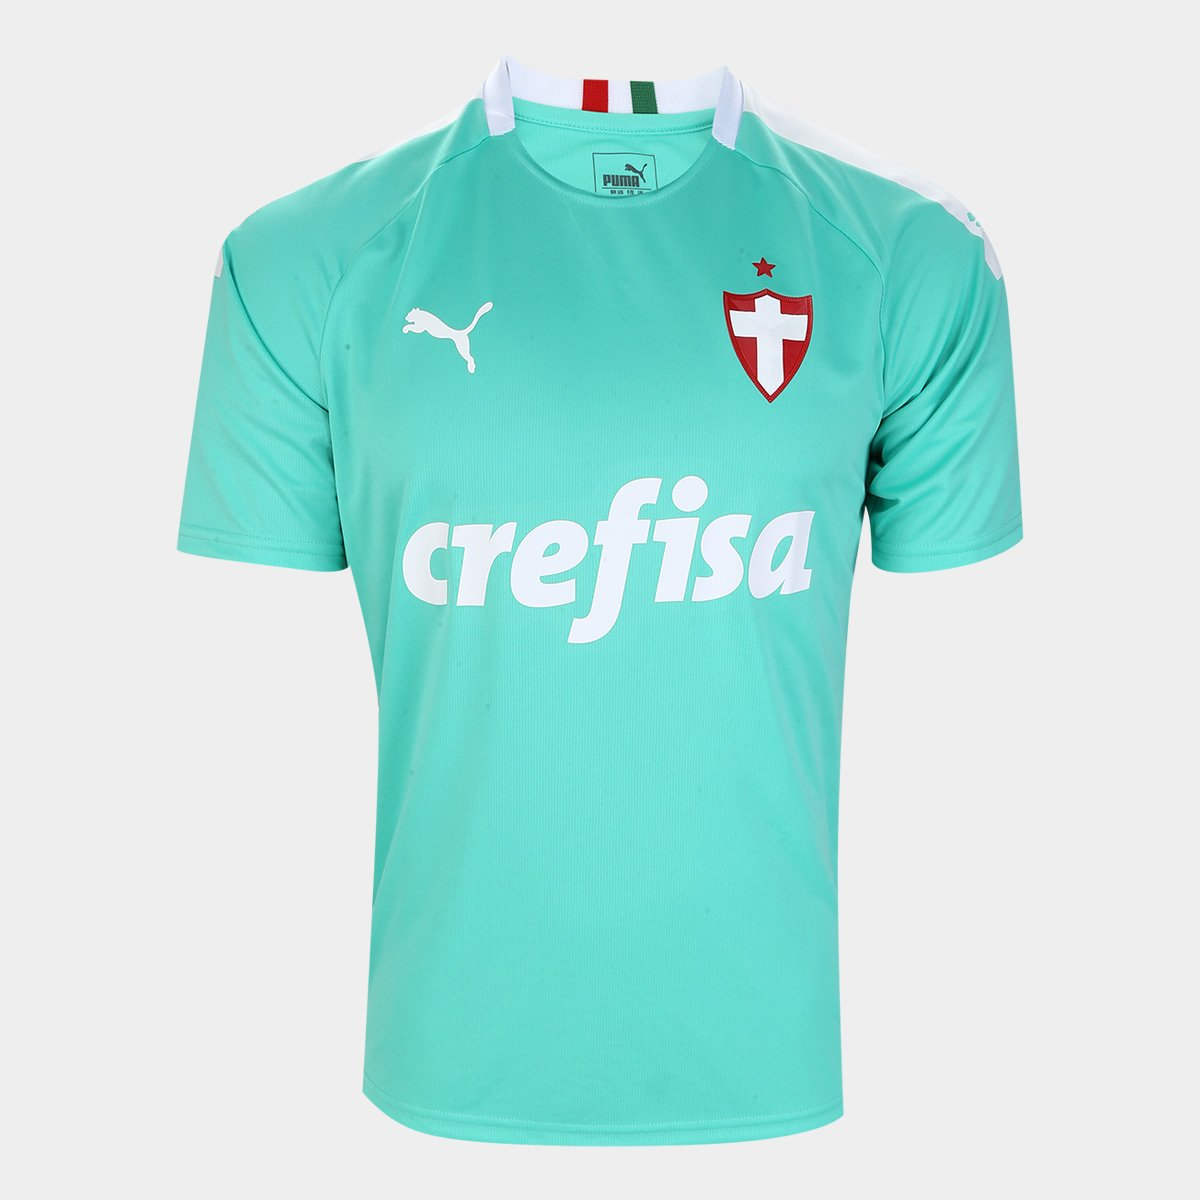 Desnudo Cartero Generalmente hablando  Camisa Palmeiras III 19/20 s/n° - Torcedor Puma Masculina - Verde água |  Netshoes